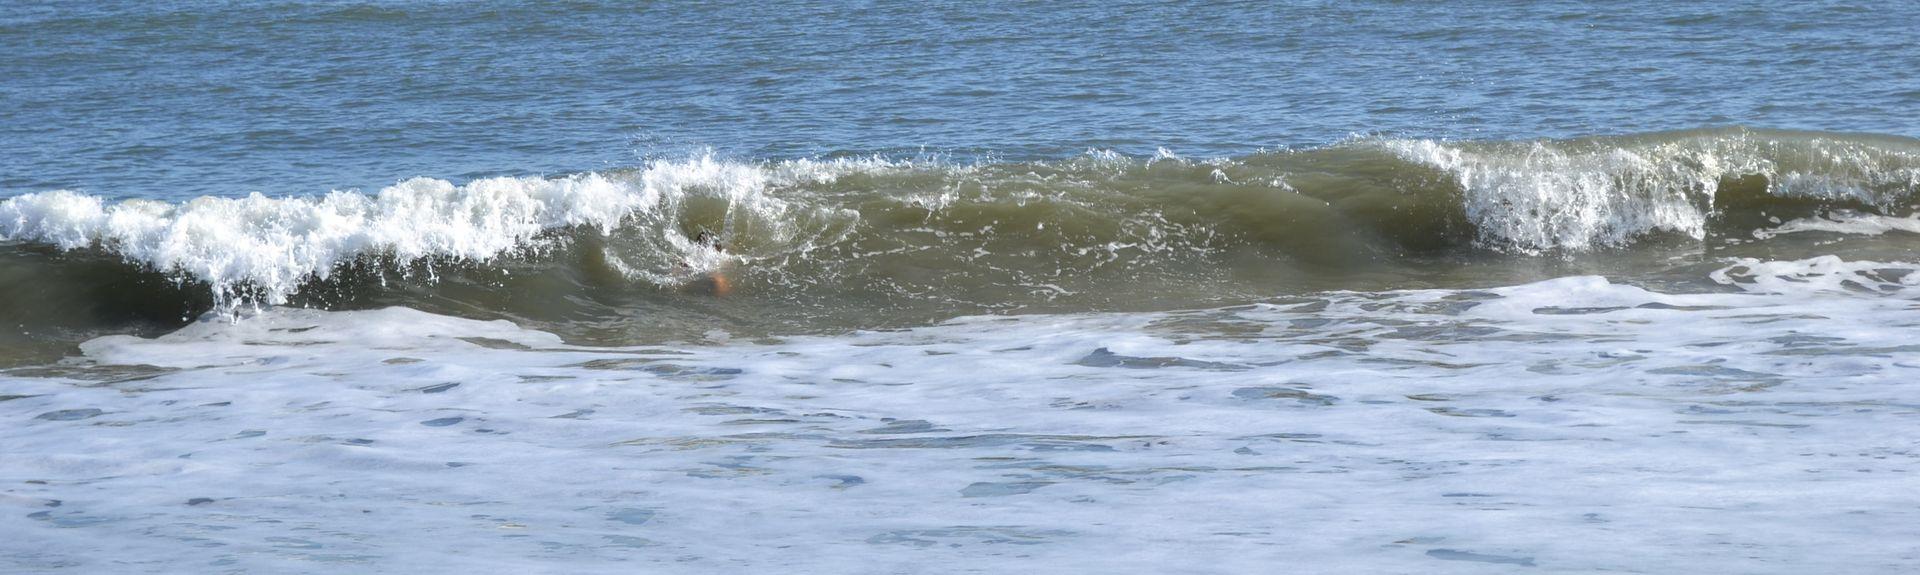 Tidewater, Isle of Palms, South Carolina, United States of America